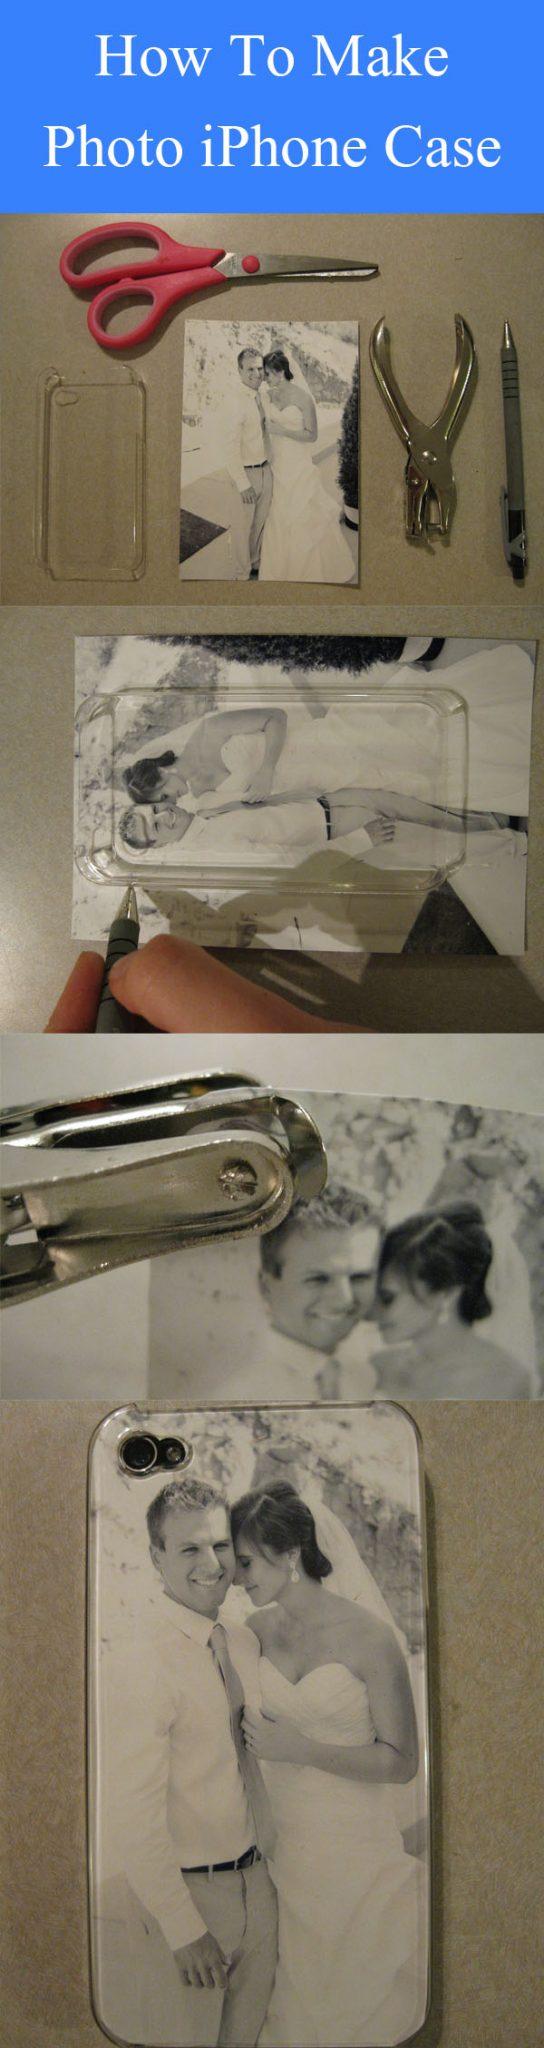 DIY Photo iPhone Case